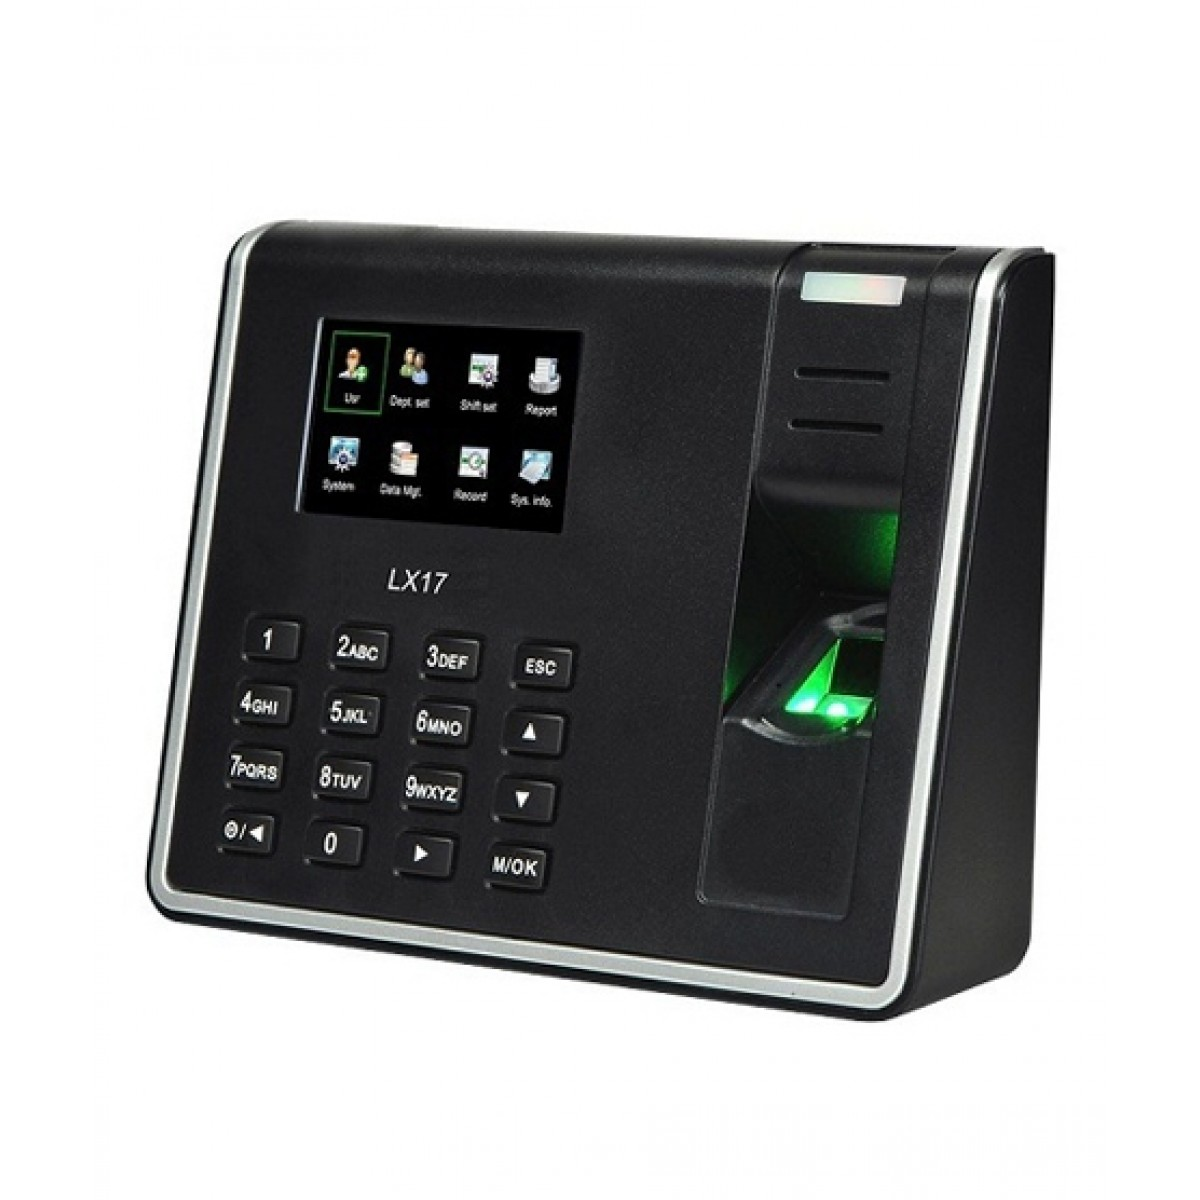 Link Corporation 3 in 1 Biometric Fingerprint Time Attendance Machine